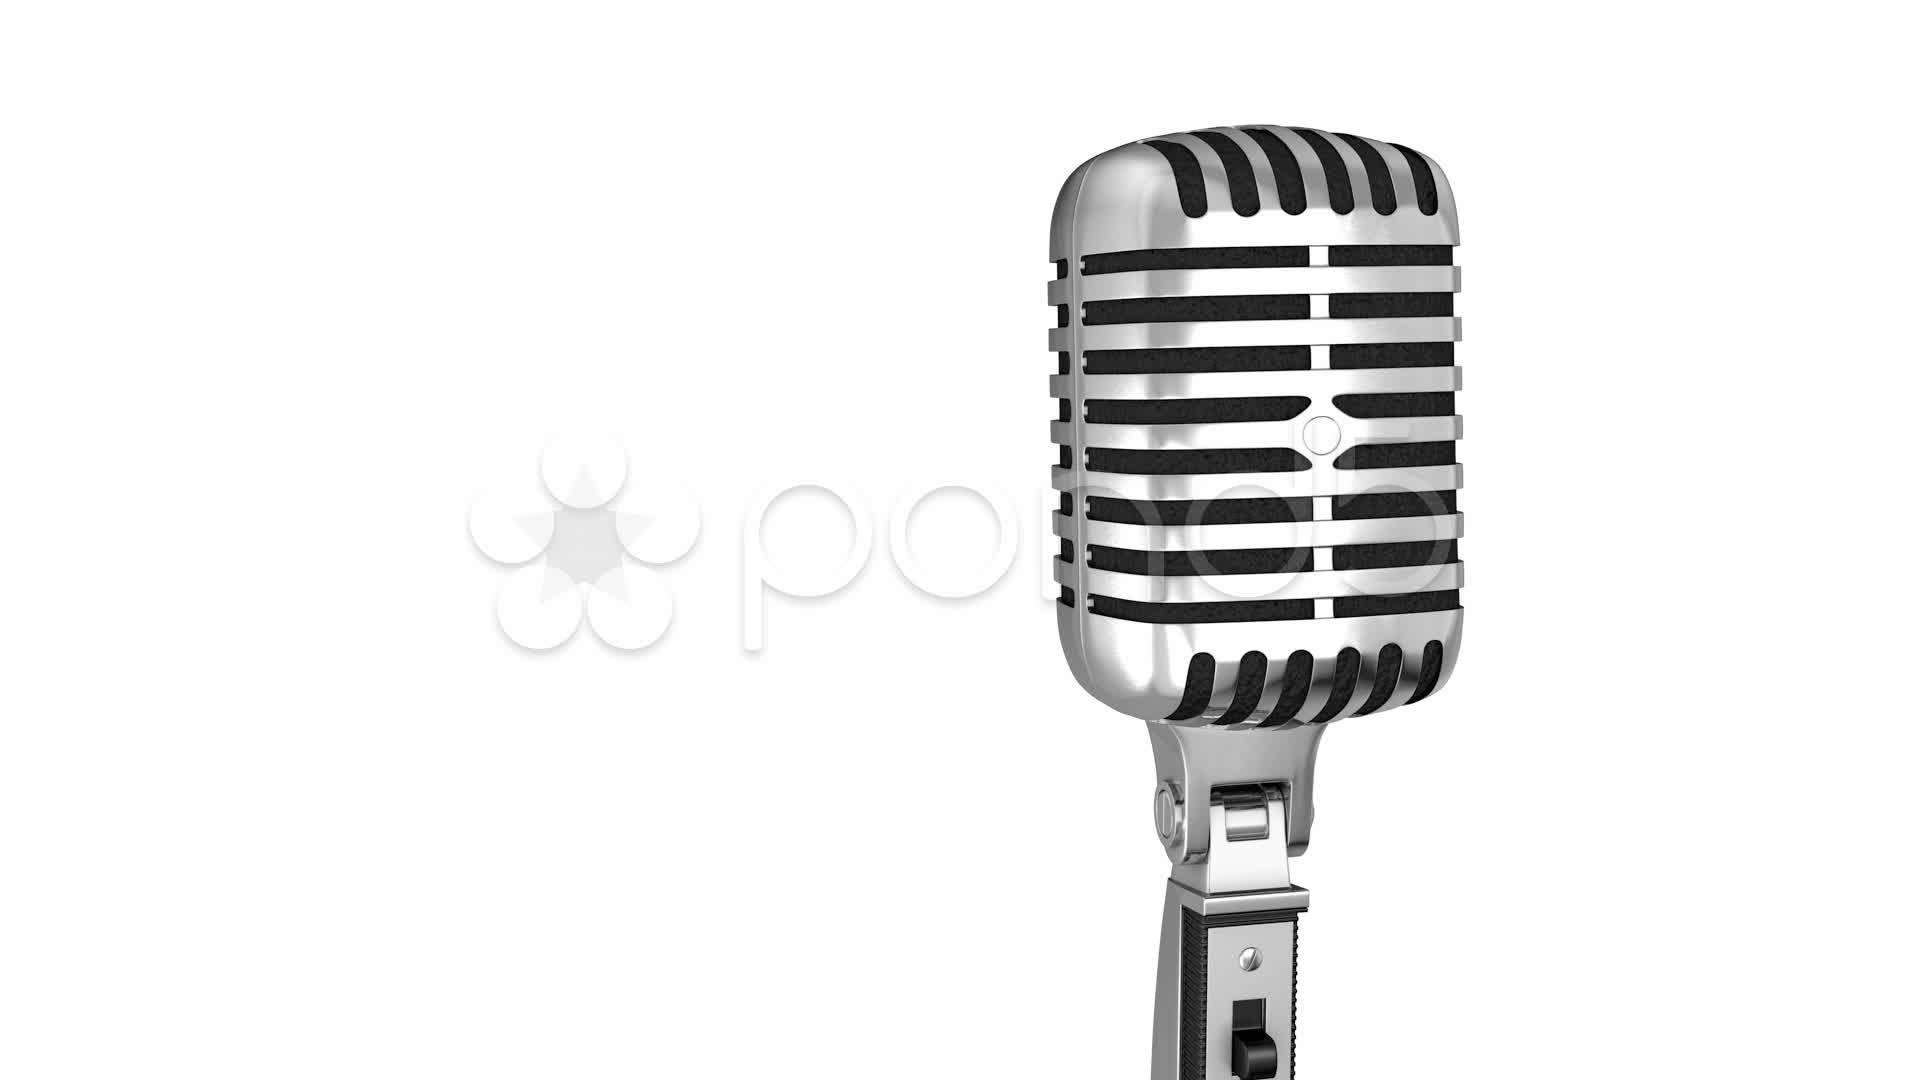 Radio microphone wallpapers top free radio microphone - Microphone wallpaper ...